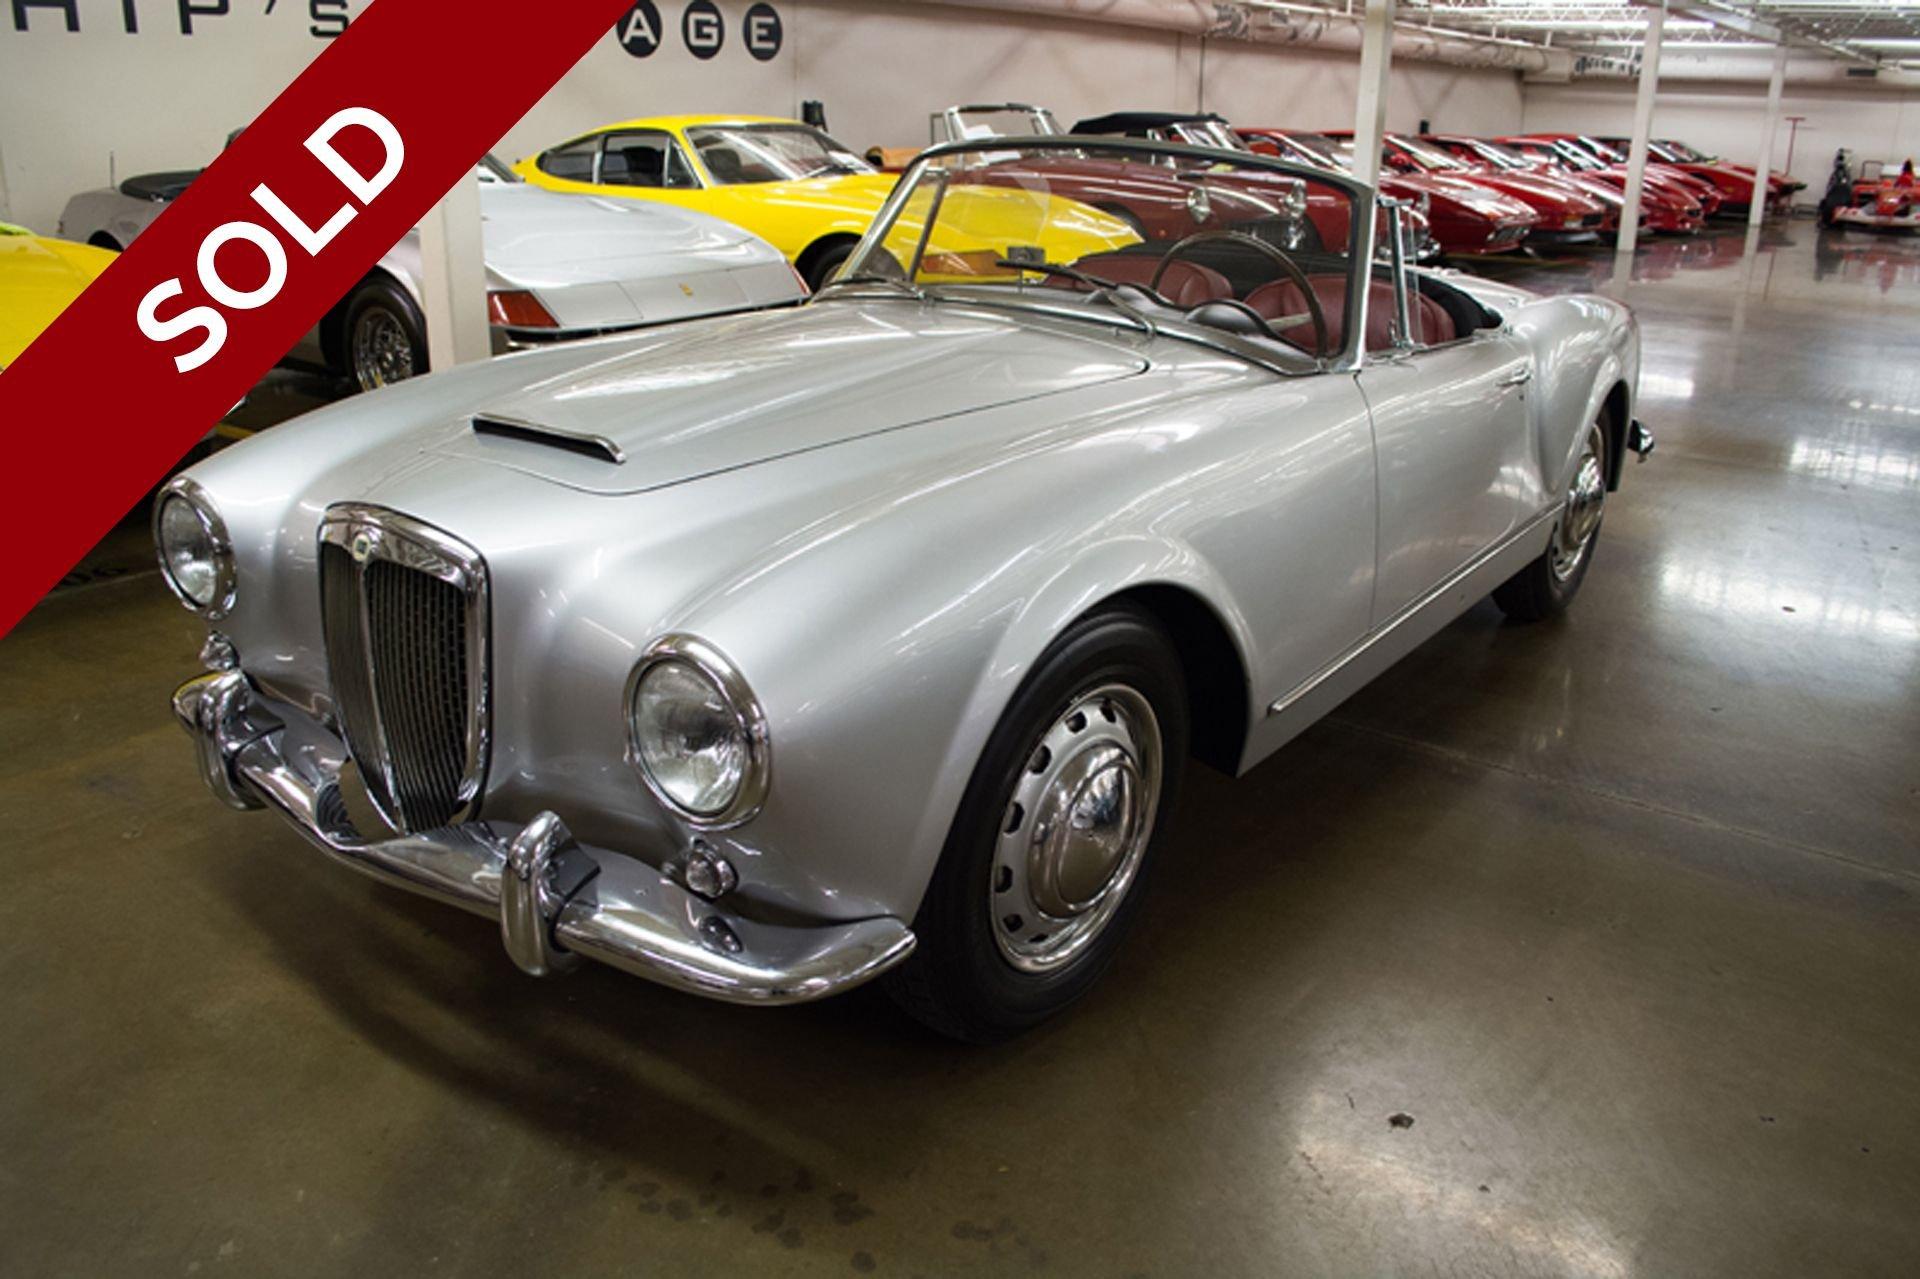 Sold 1959 lancia aurelia b24s